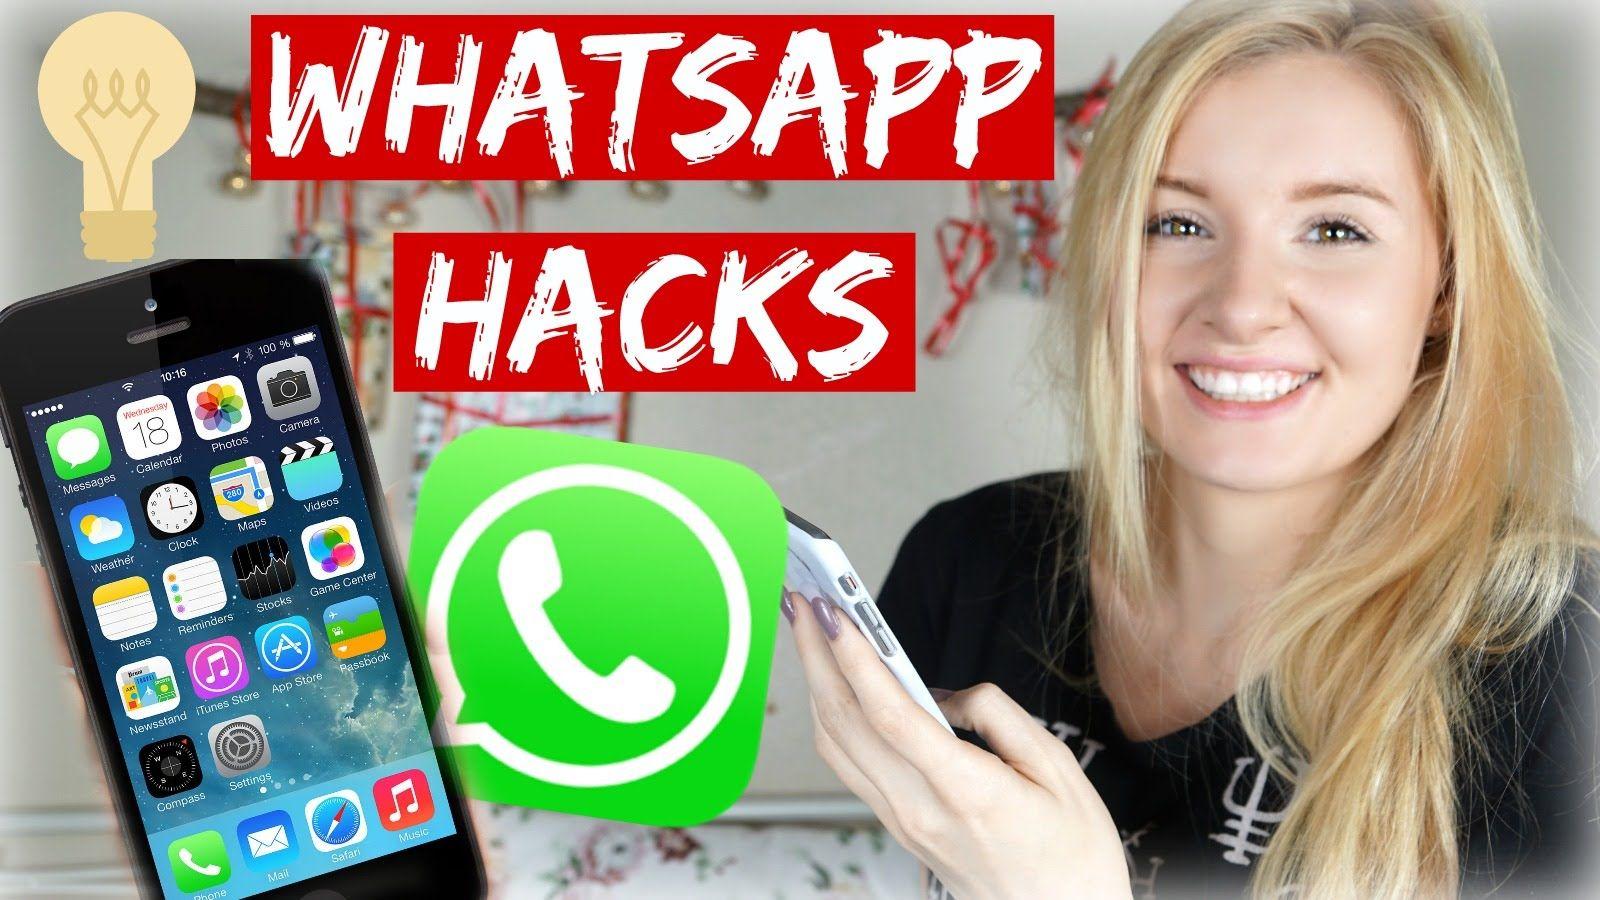 11 geniale whatsapp hacks tipps und tricks f r 39 s smartphone social media pinterest. Black Bedroom Furniture Sets. Home Design Ideas